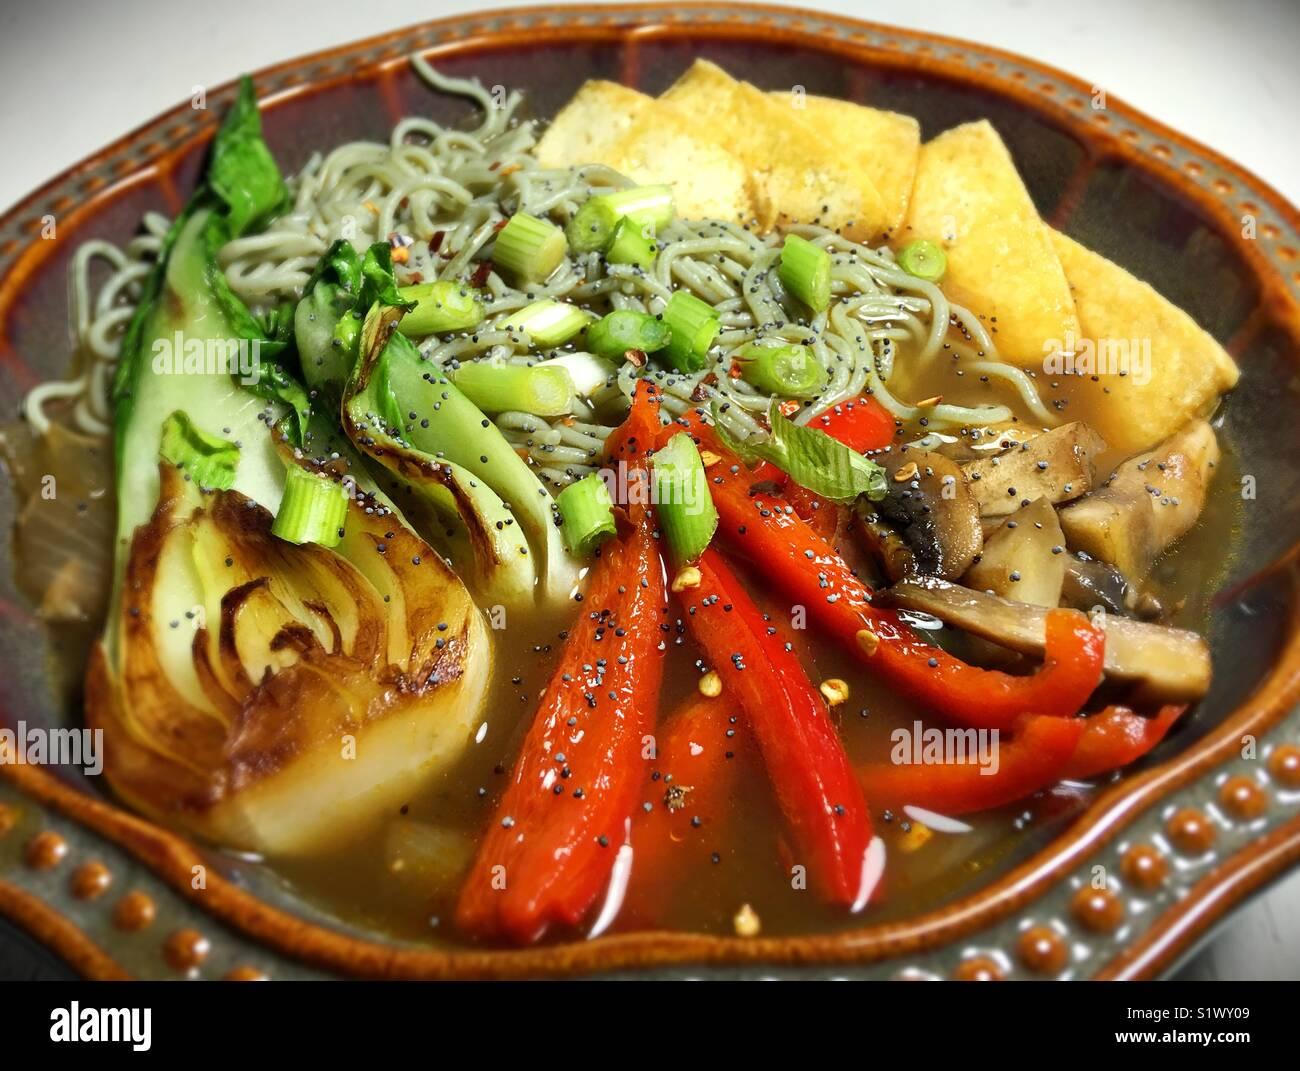 A bowl of ramen. - Stock Image